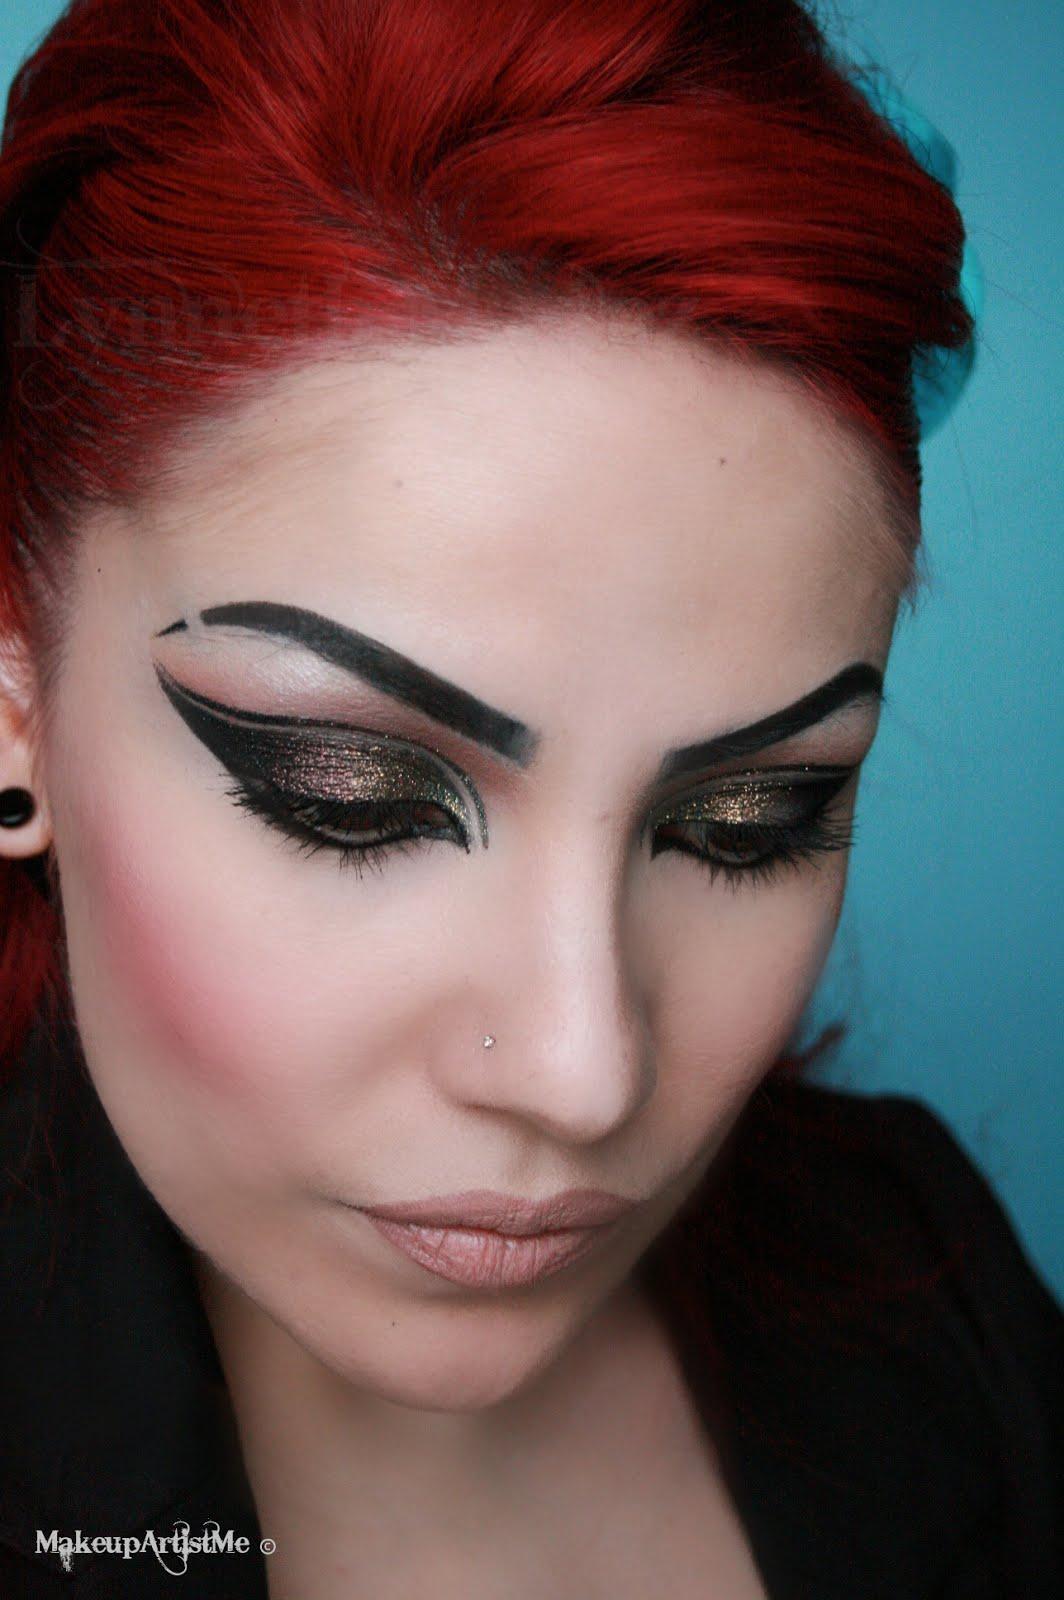 Gypsy Makeup Tutorial Halloween - Diy Makeup Ideas